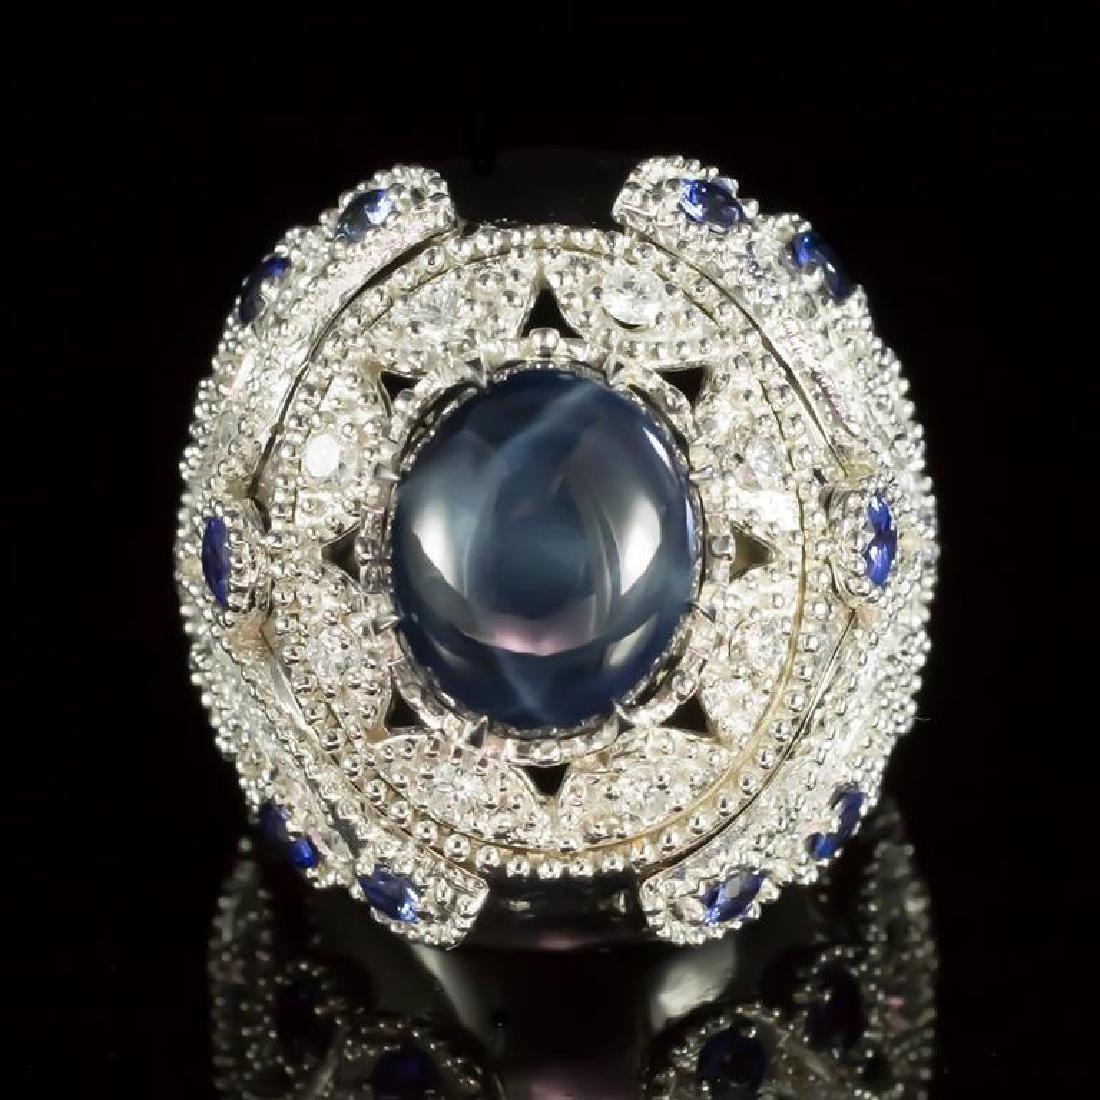 14K Gold 11.61ct Star Sapphire, 1.38ct Sapphire 1.55ct